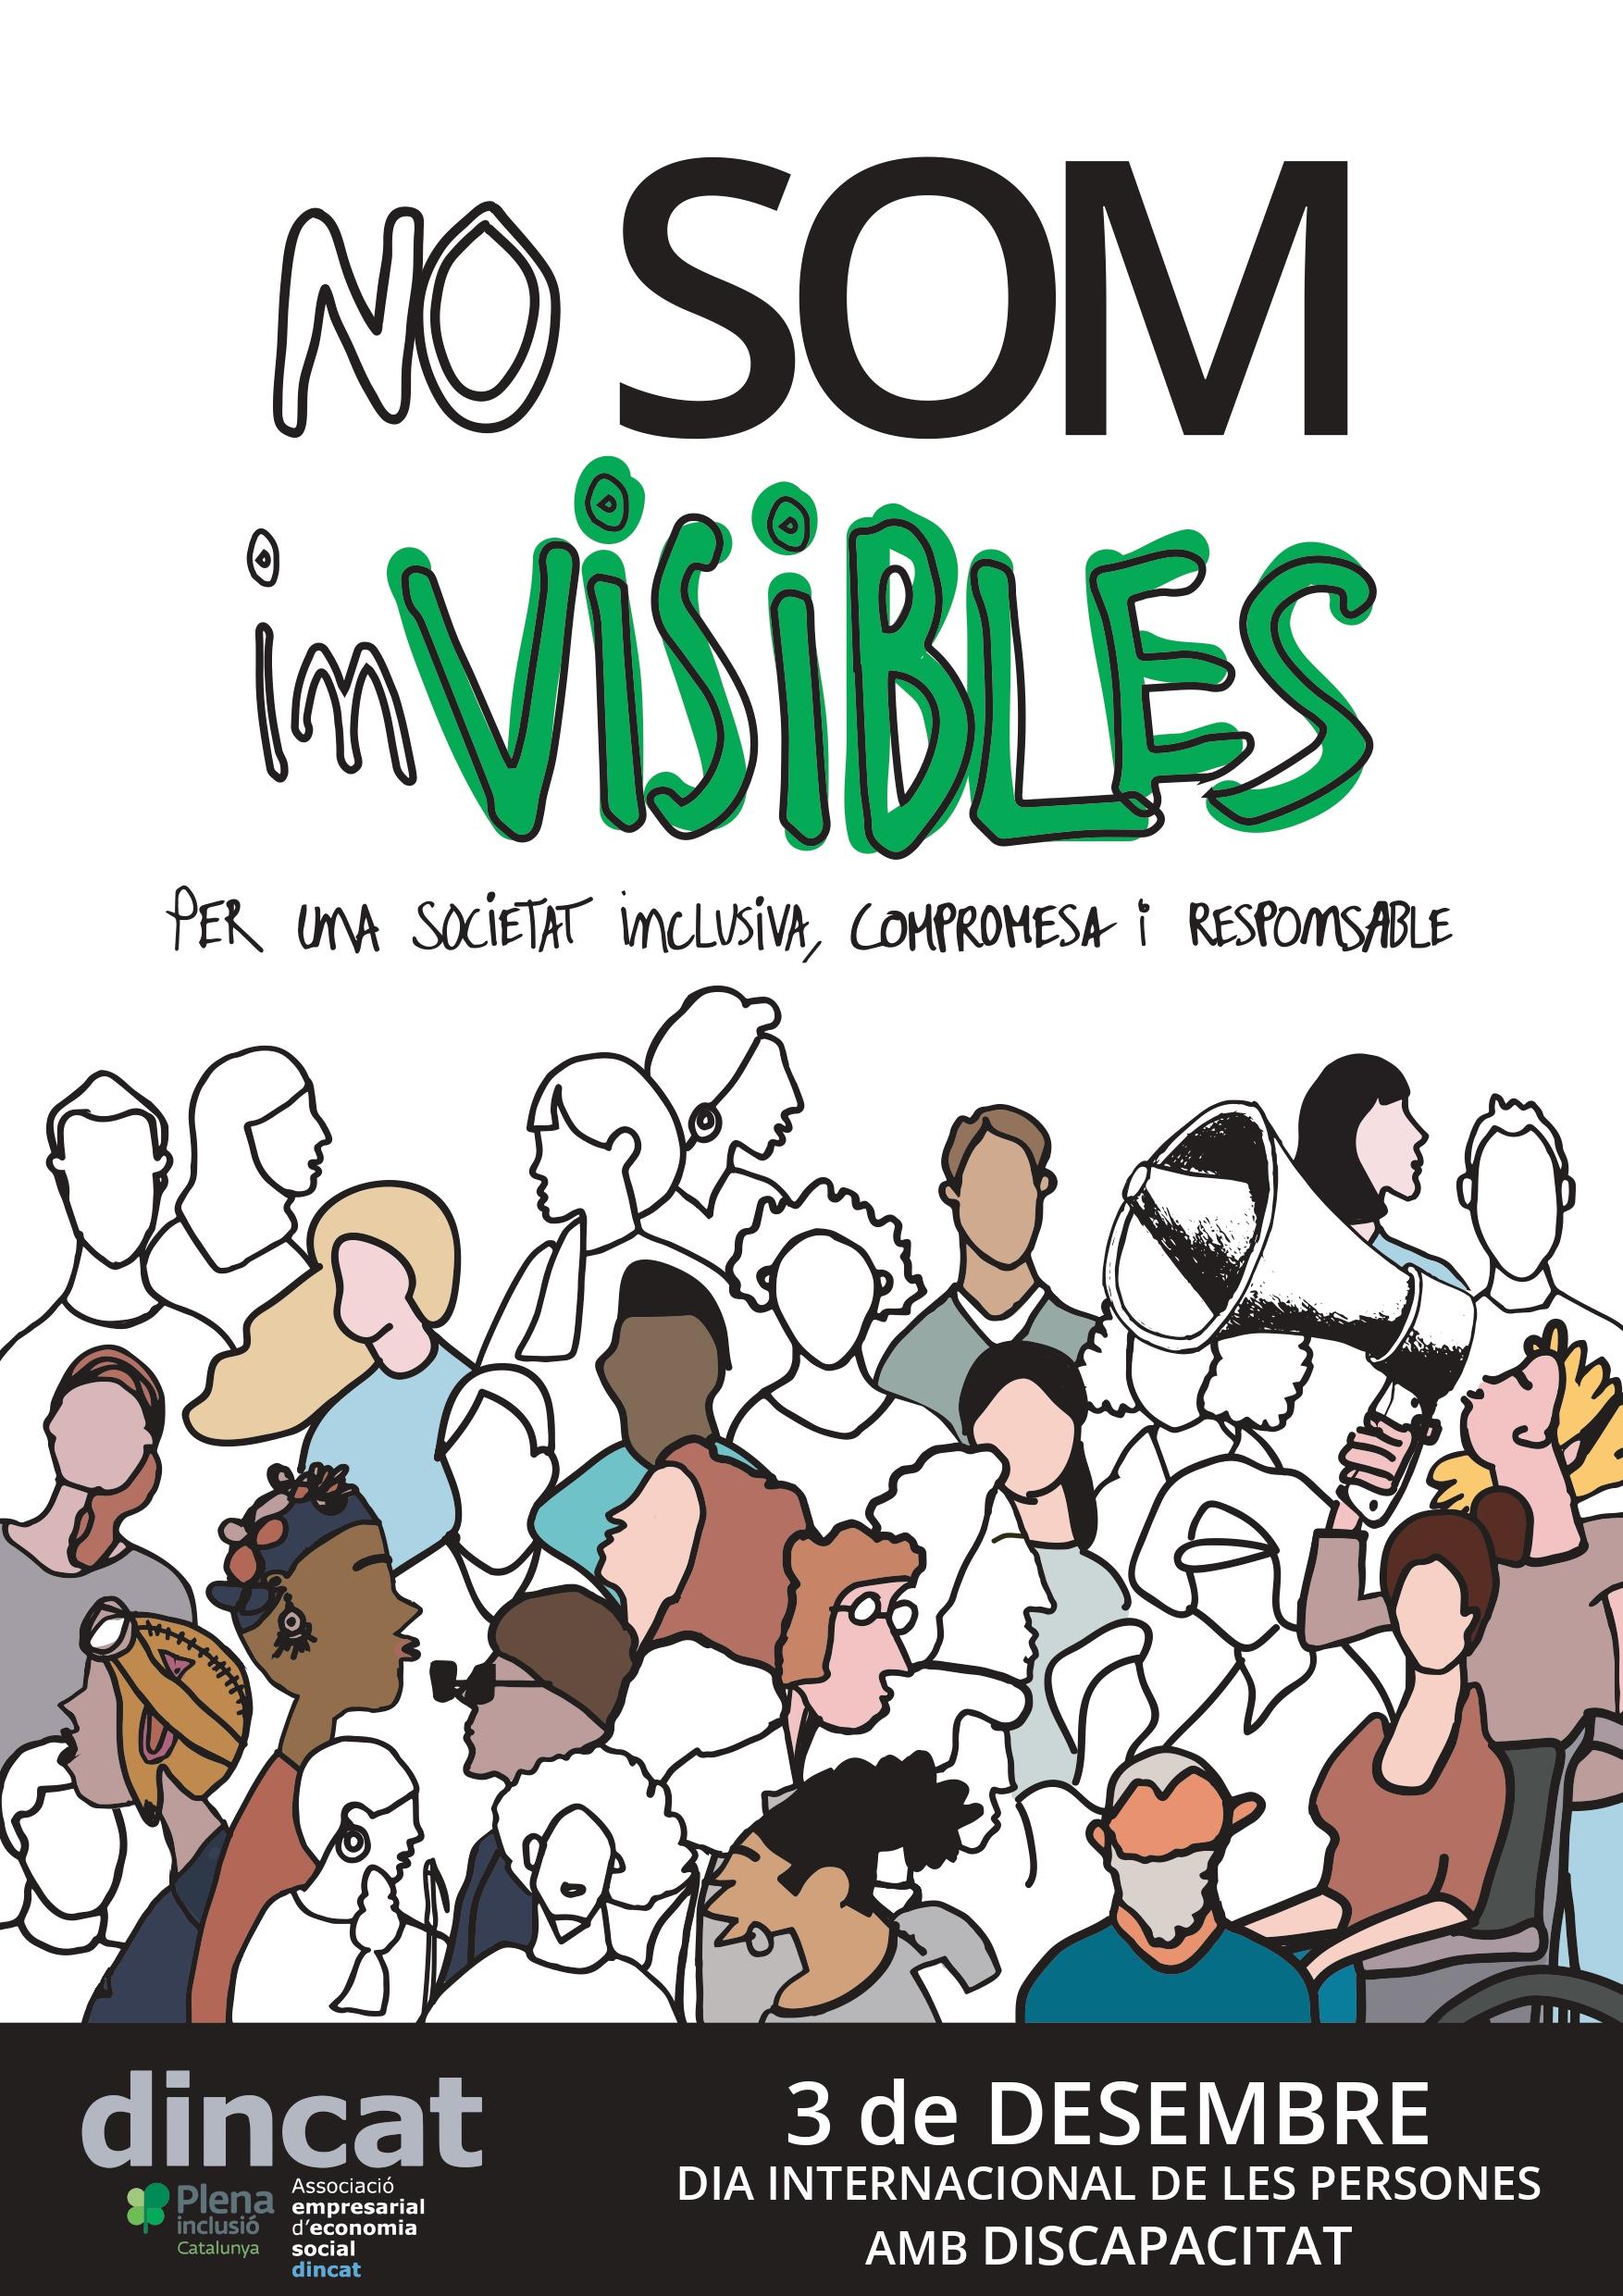 No som invisibles